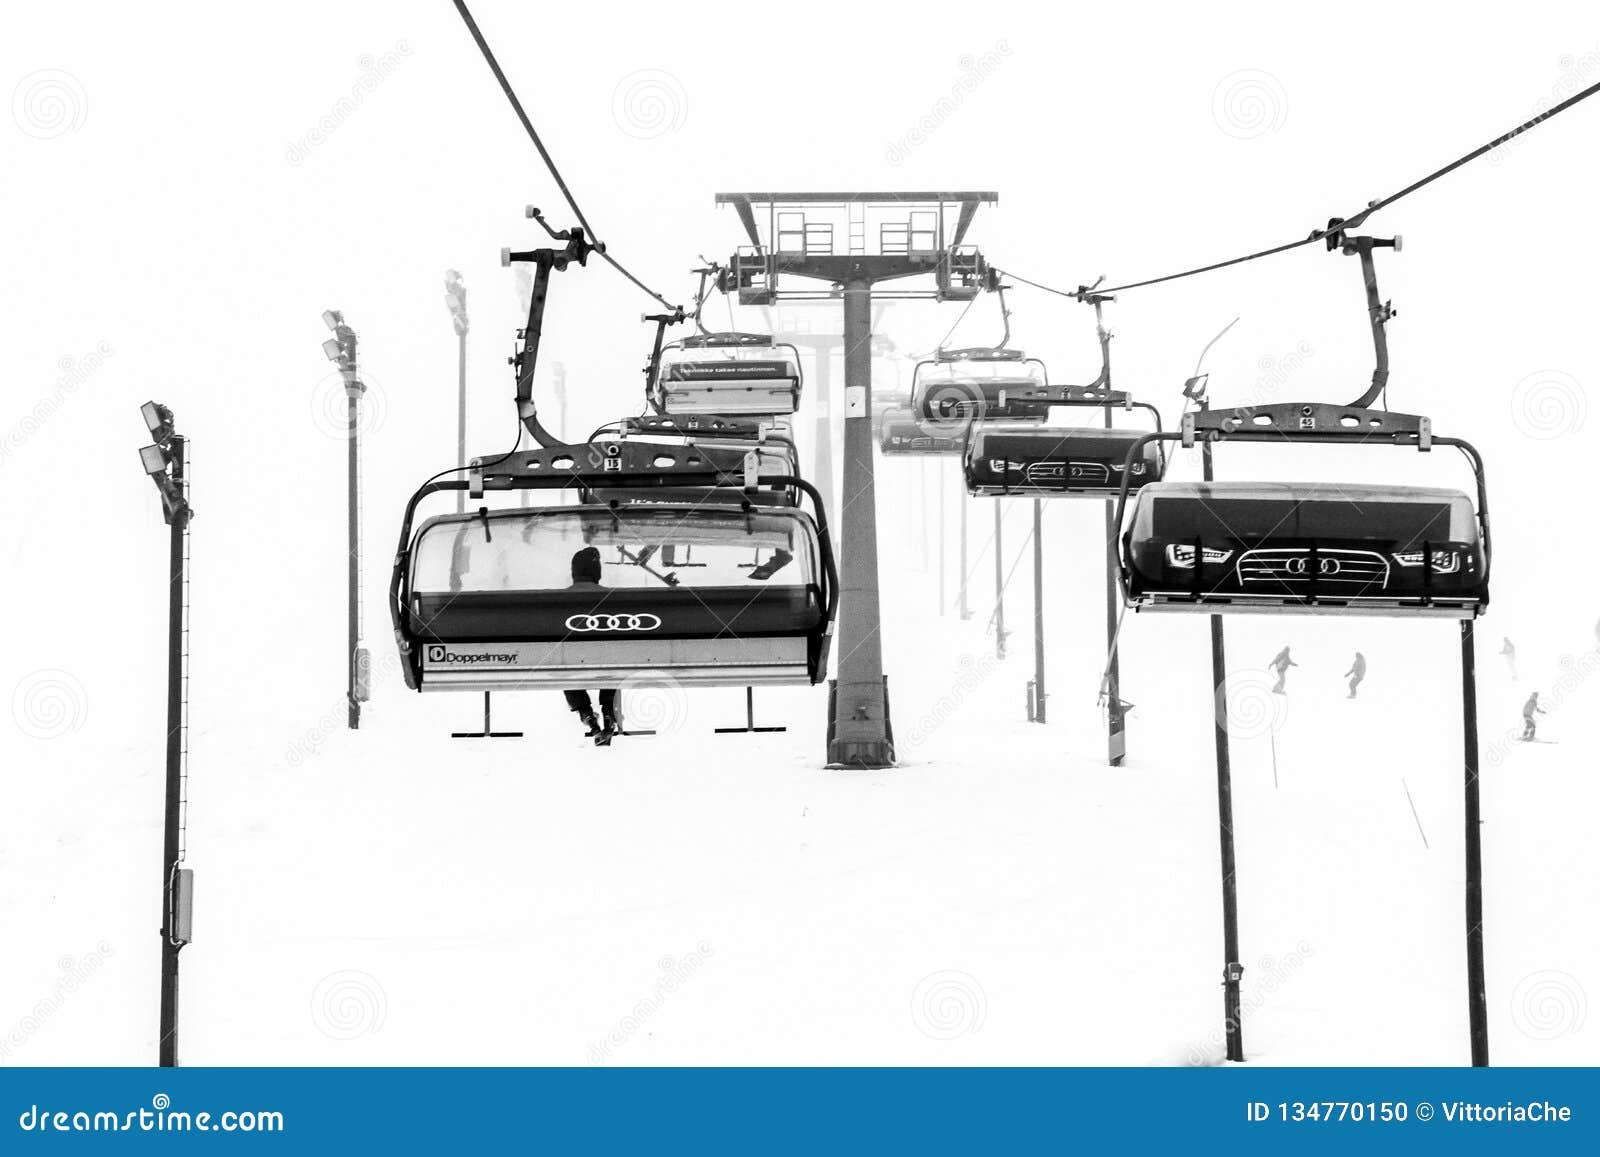 Ruka, Finnland - 24. November 2012: Skifahrer sitzen auf dem Stuhlskiaufzug an Ruka-Skiort an einfrierendem Tag